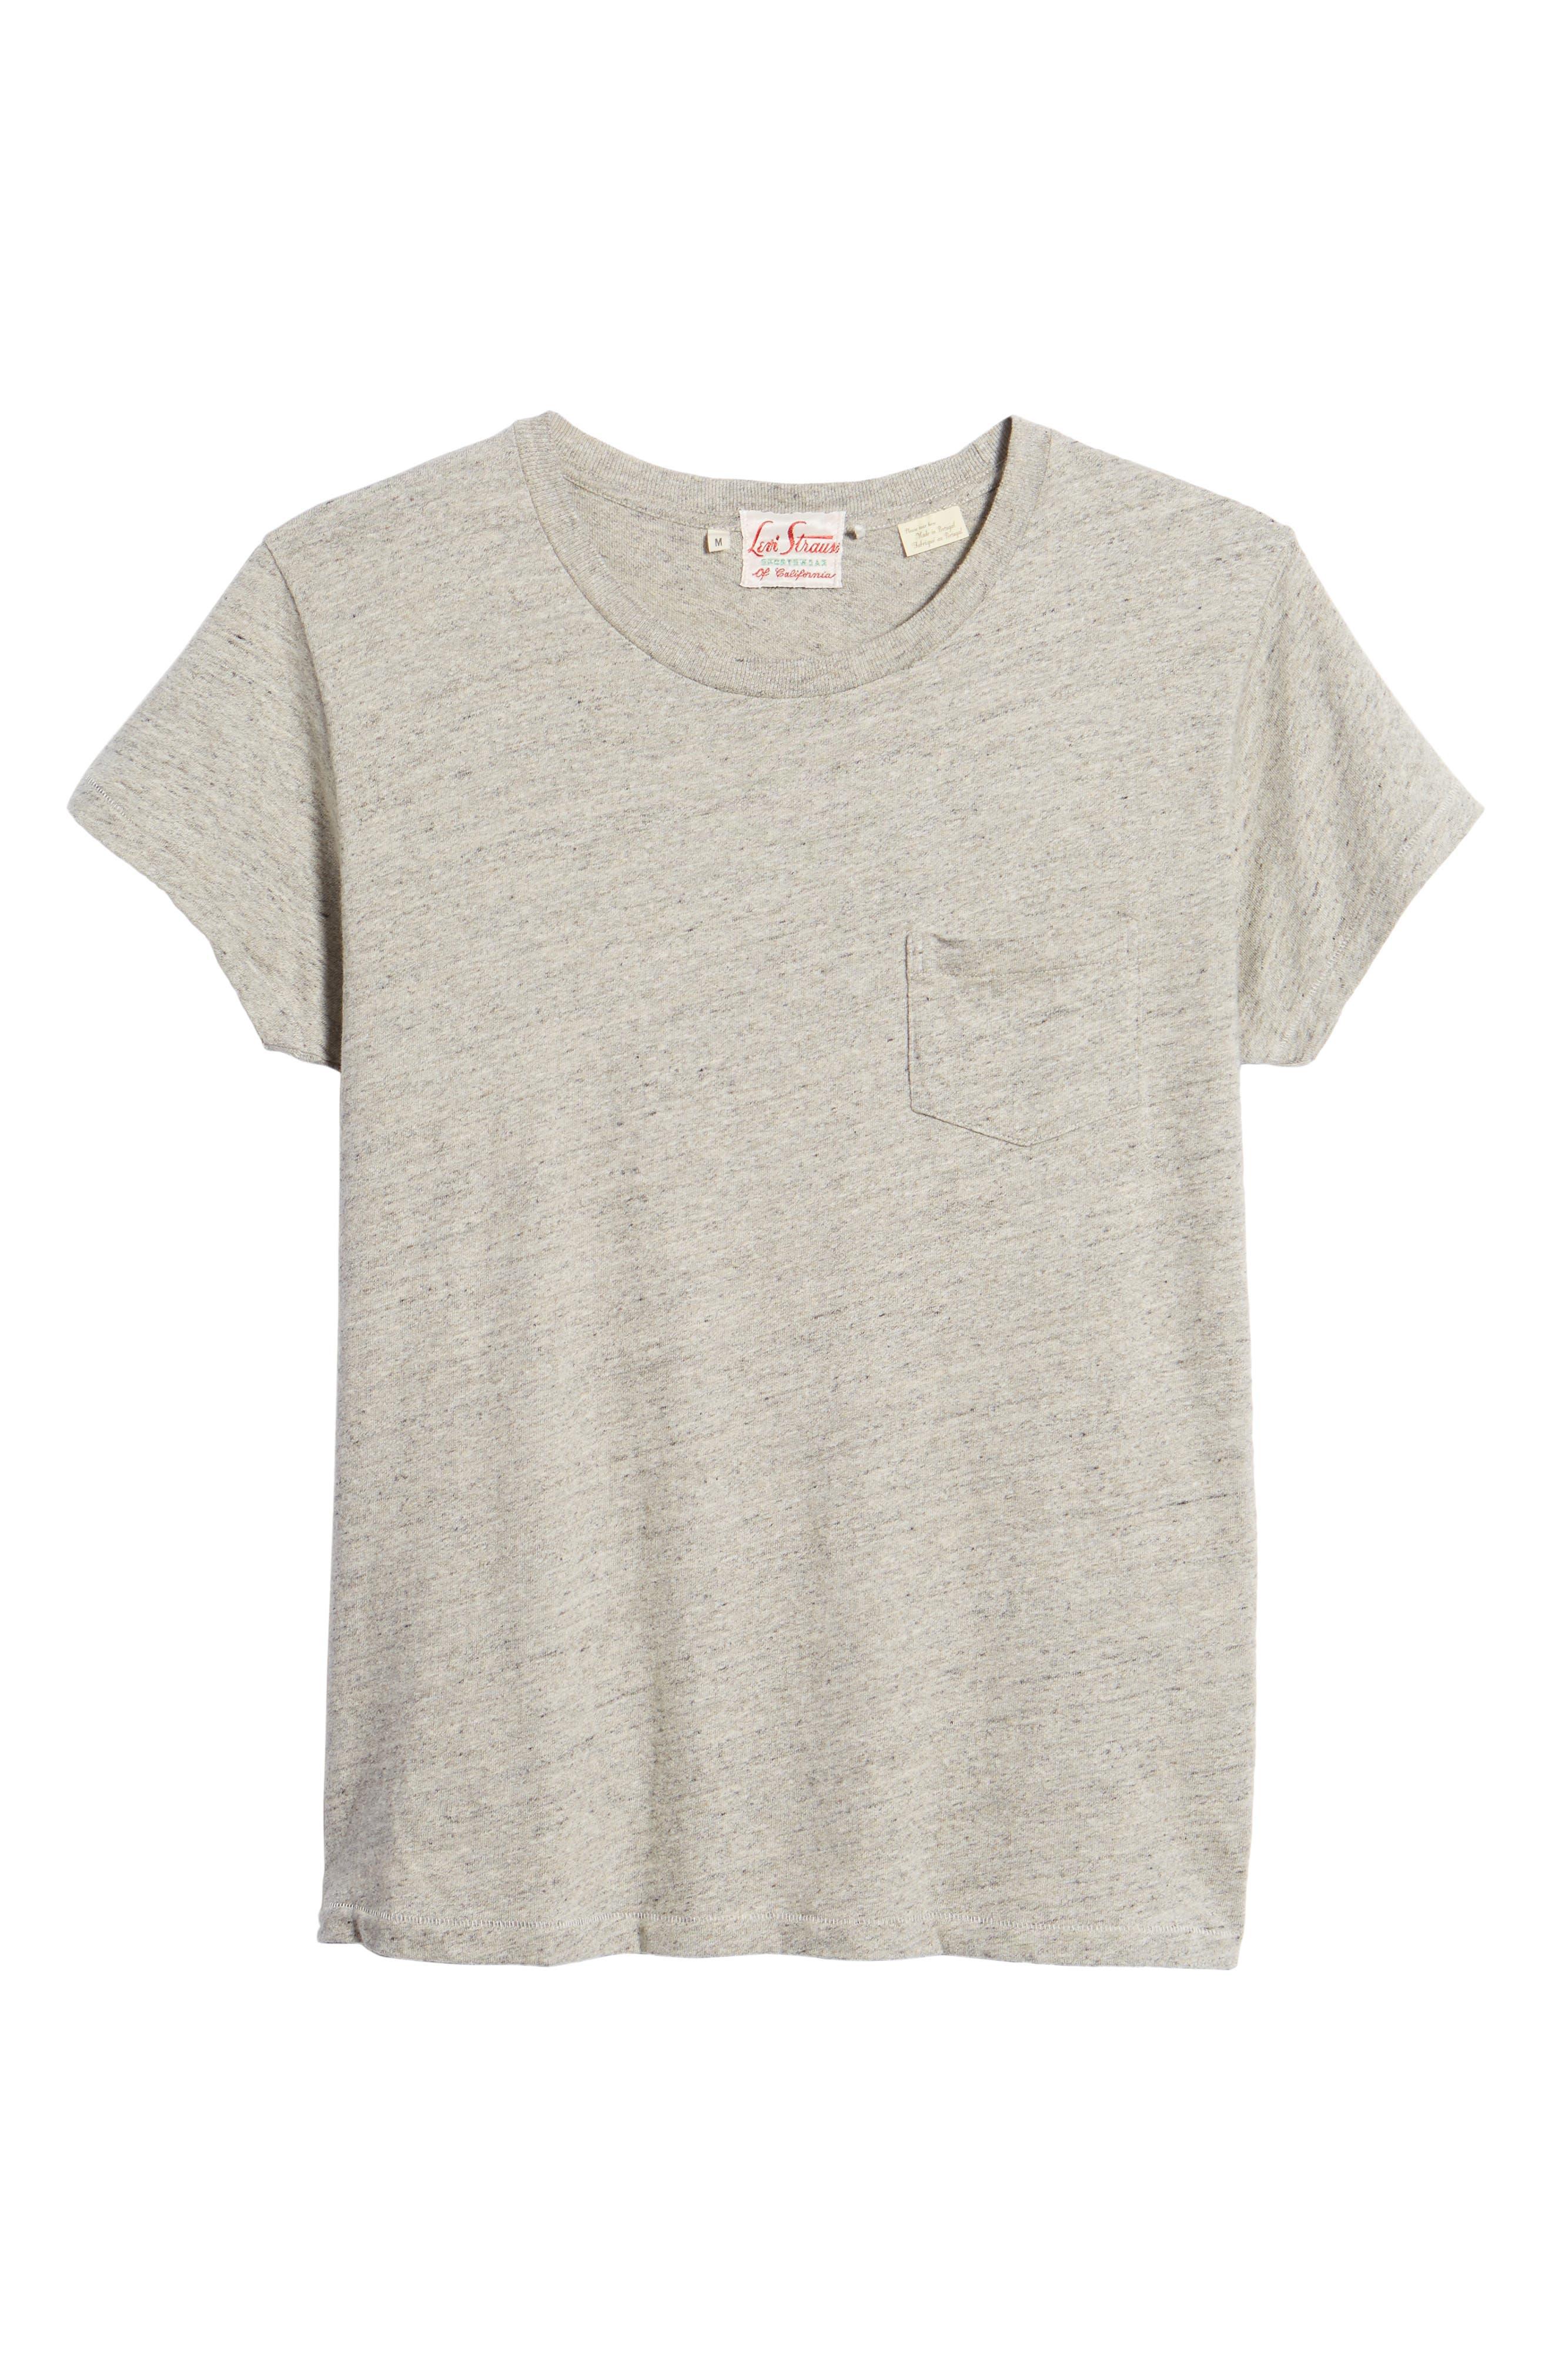 Levi's Vintage Clothing 1950s Sportswear Pocket T-Shirt,                             Alternate thumbnail 6, color,                             Grey